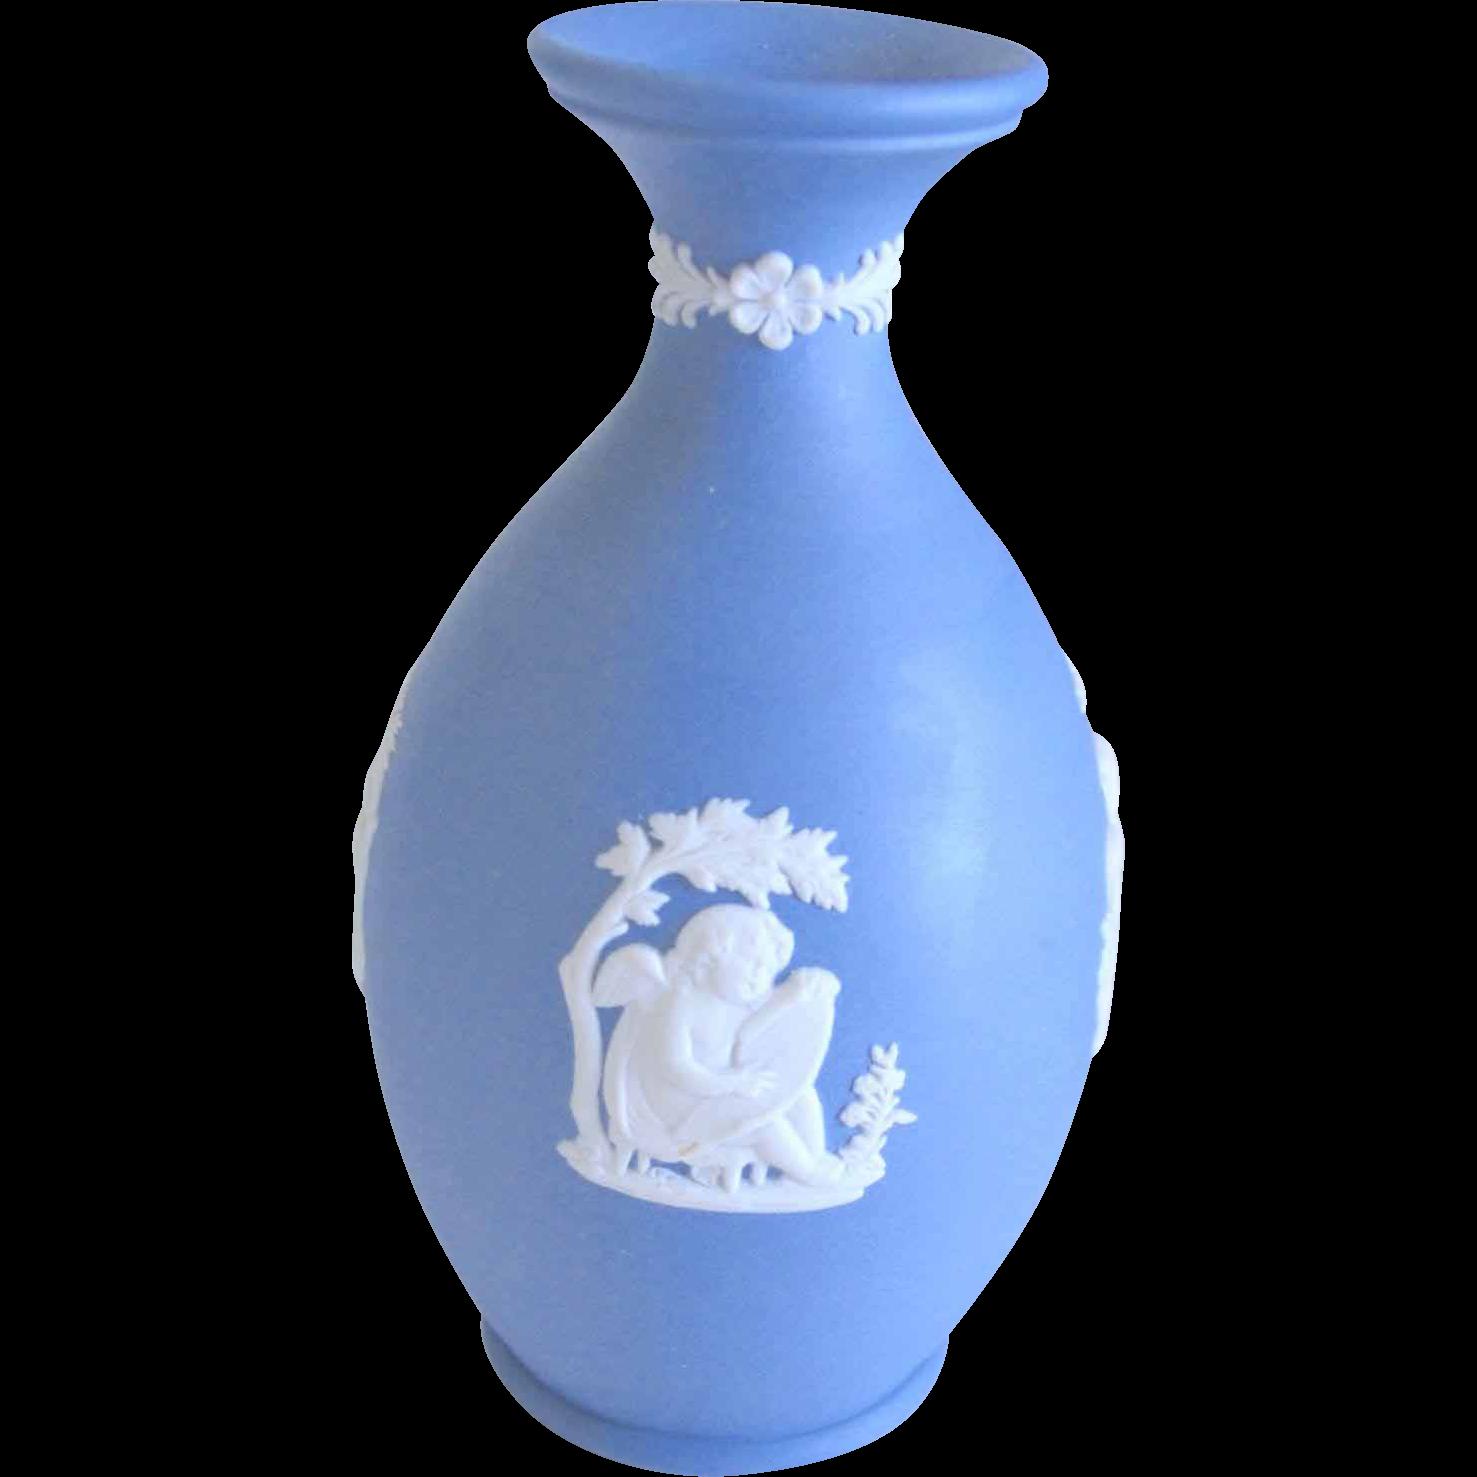 Wedgwood Jasper Ware Bisque Pottery Bud Vase